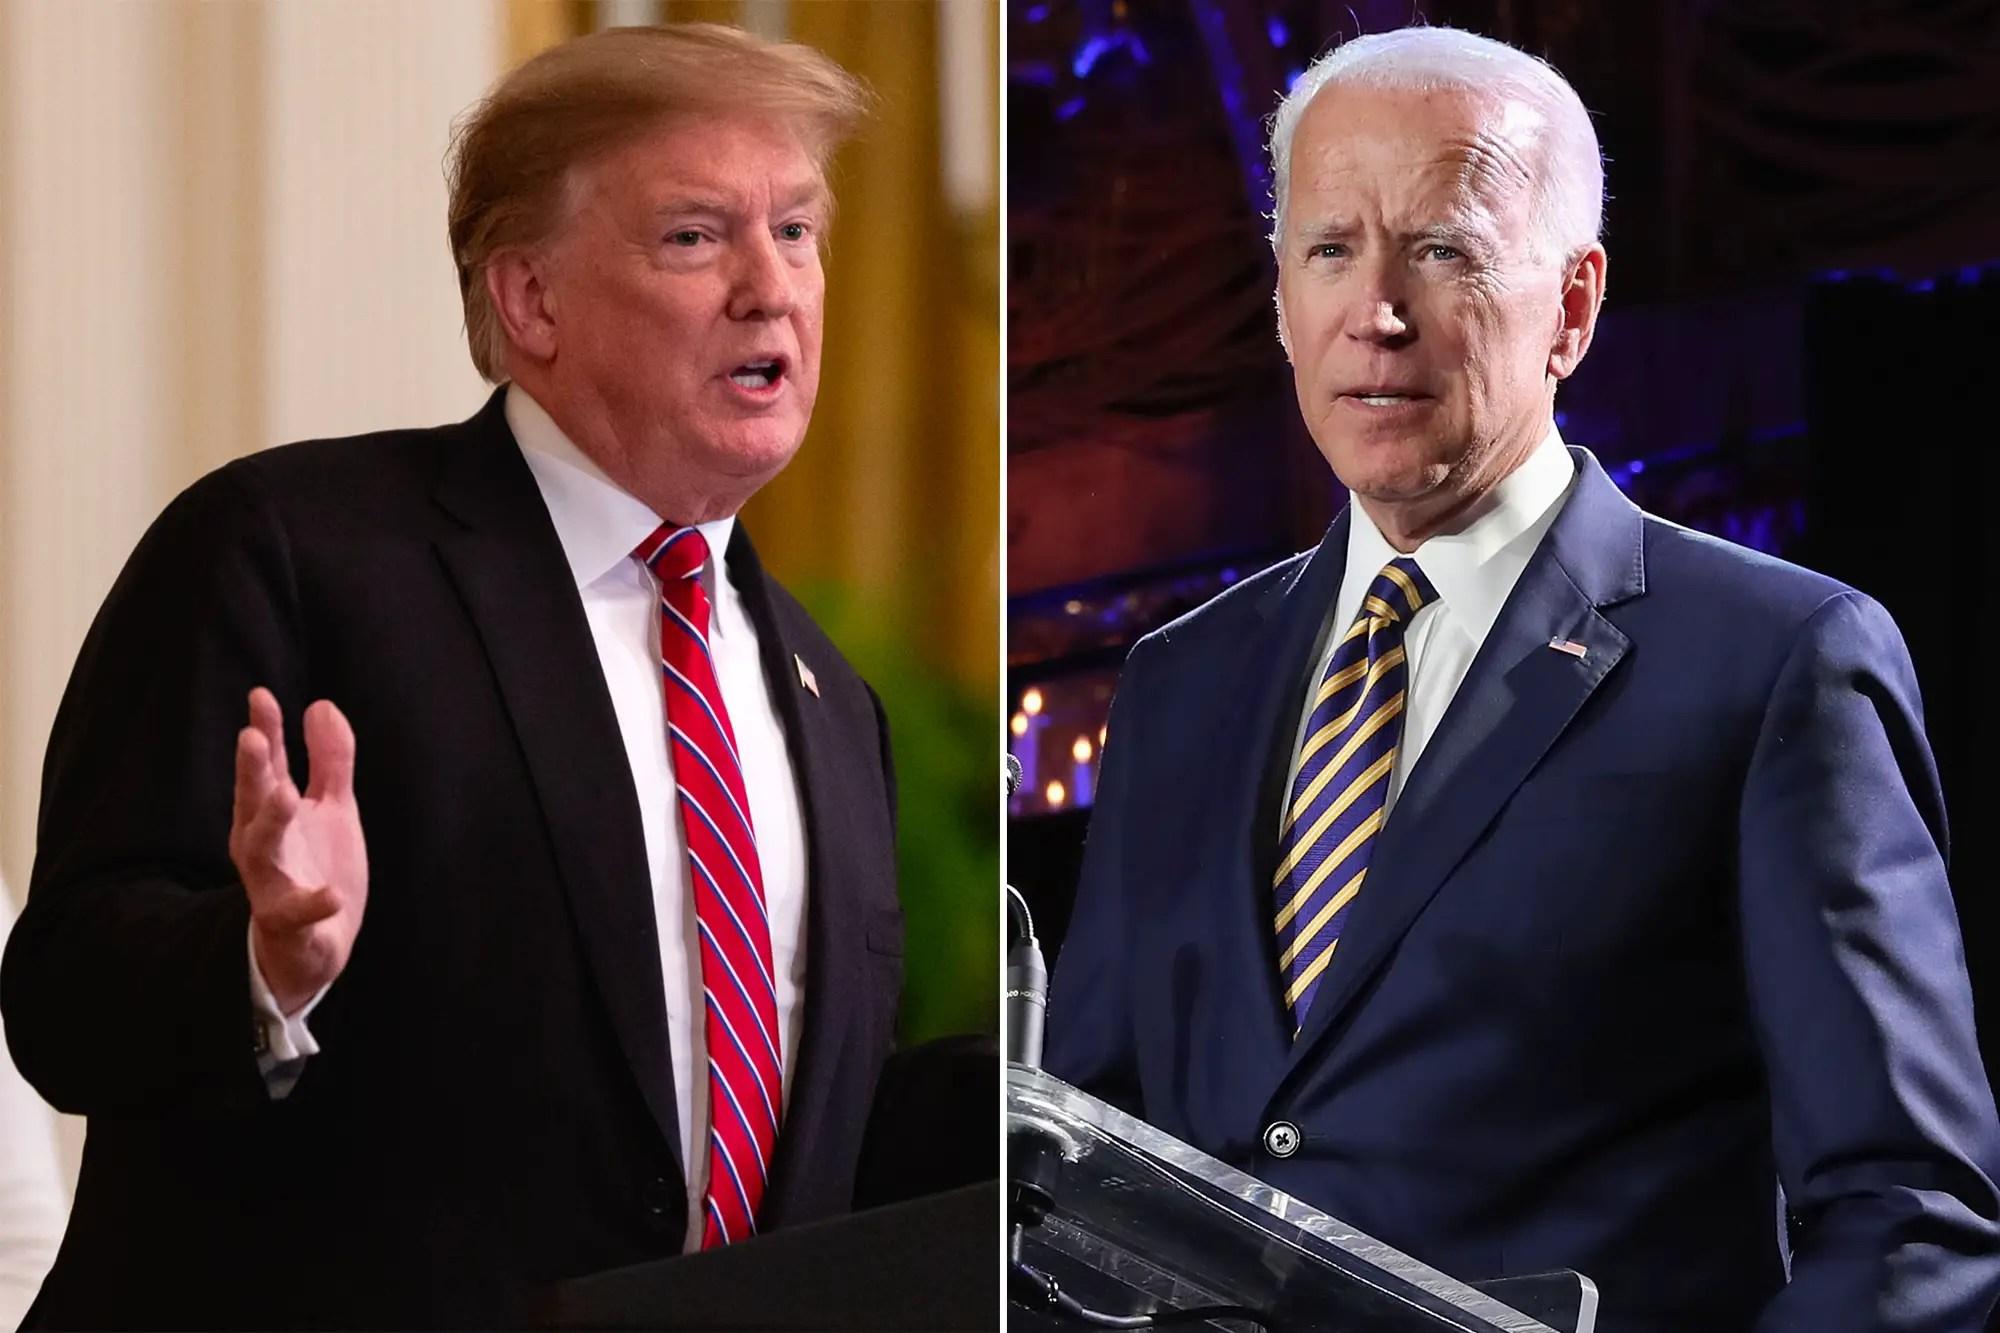 Donald Trump Joe Biden attack 2020